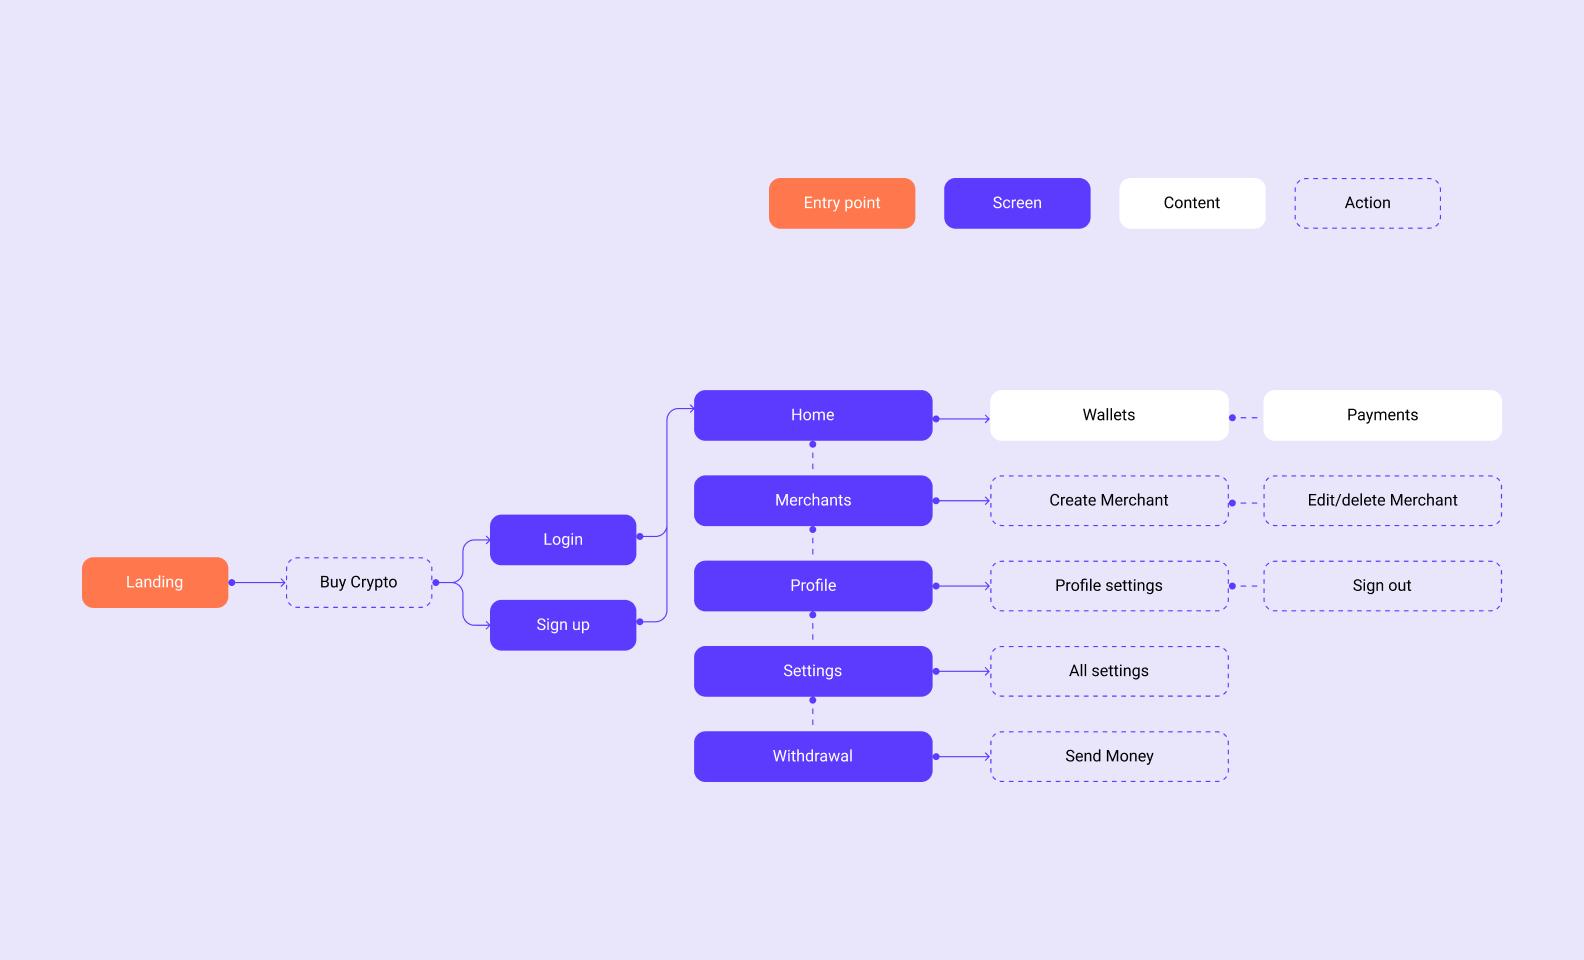 ui ux дизайн приложений — структура